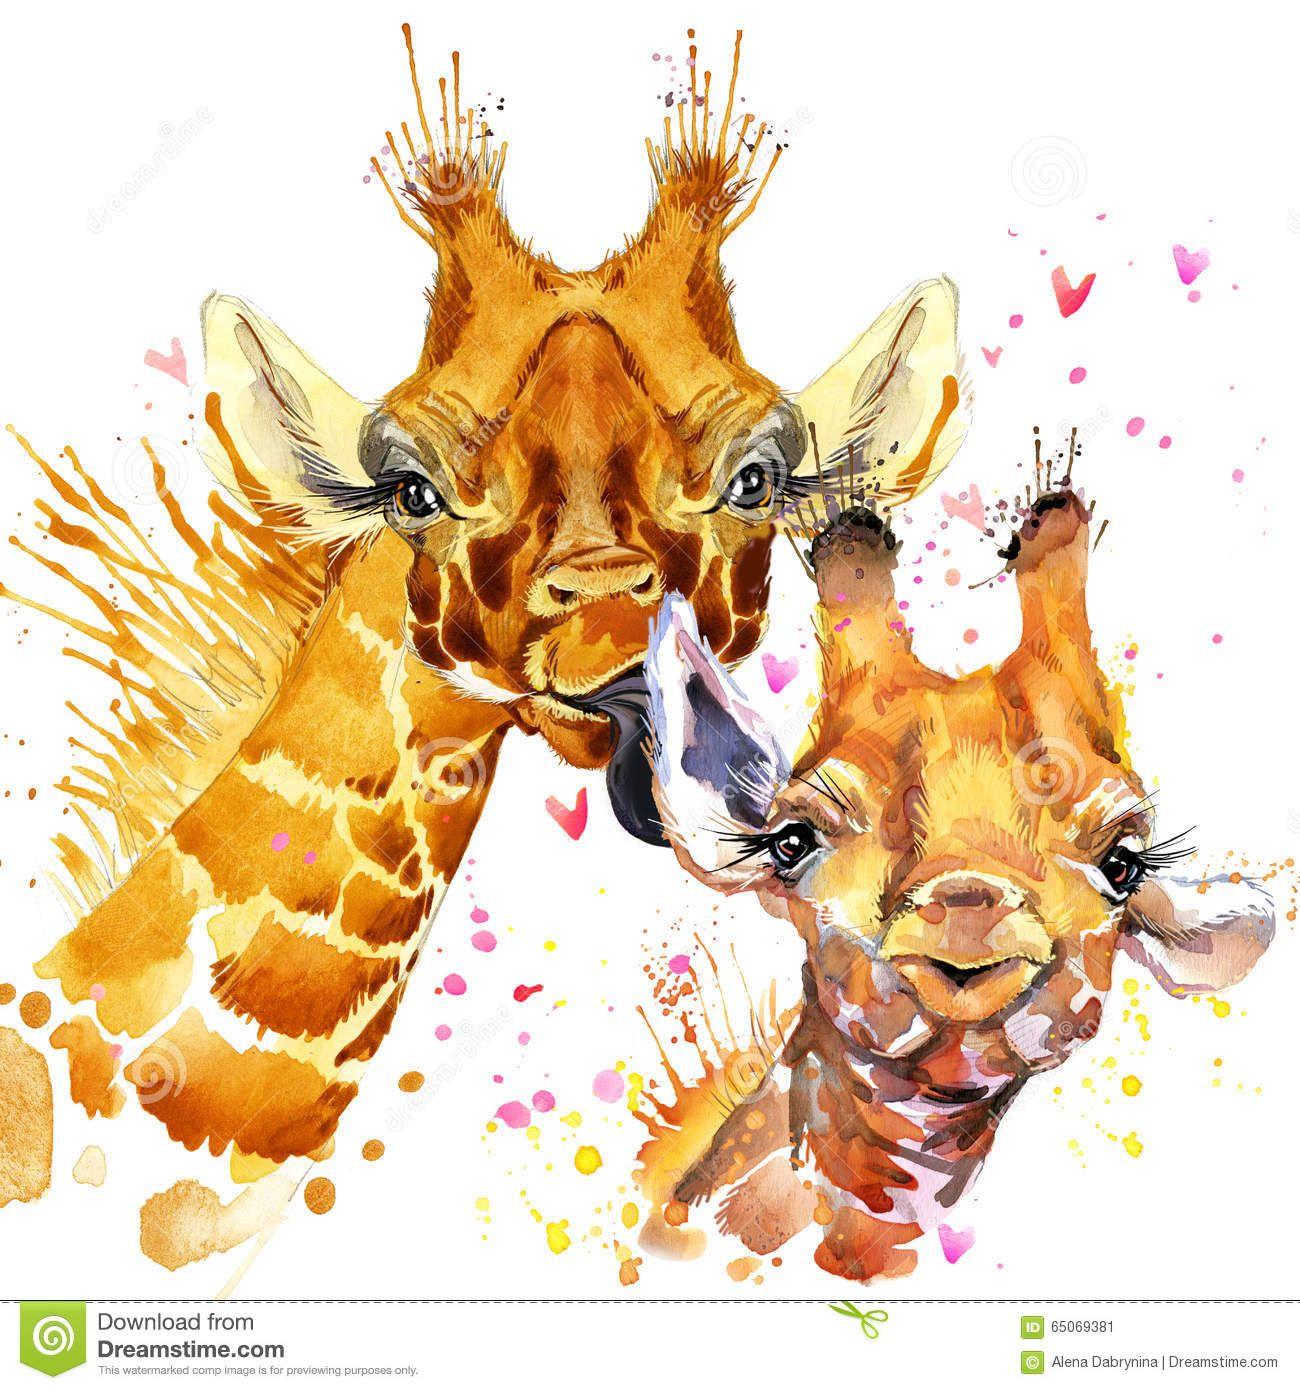 Aquarelle De Girafe Photos – 53 Aquarelle De Girafe Images ...